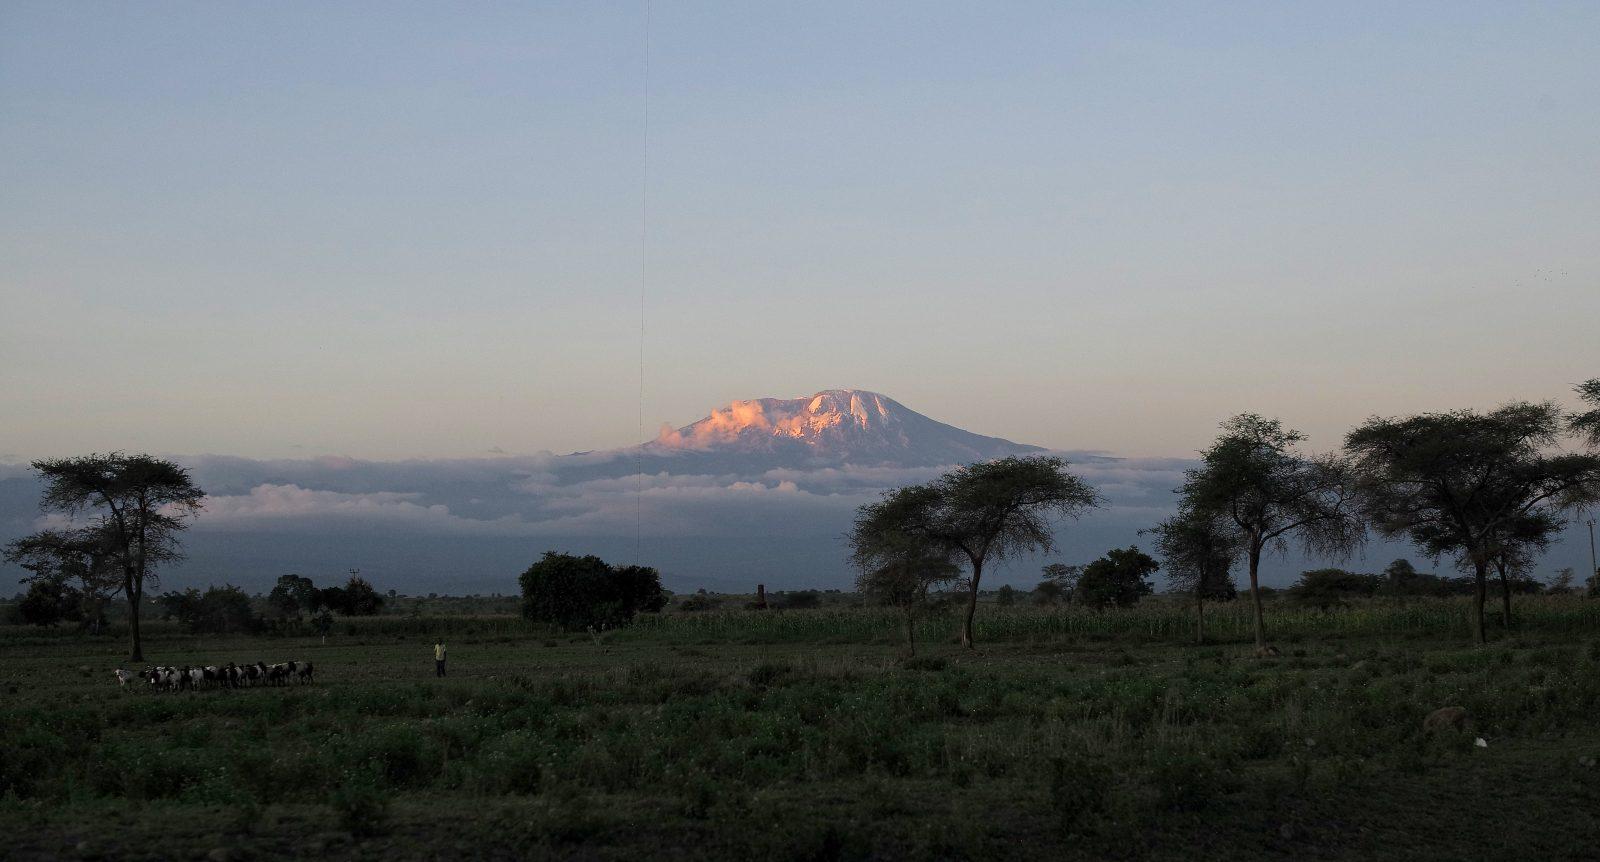 Fantastic sky at sunset over Tanzania overlooked from Mount Kilimanjaro (c) Roman Boed